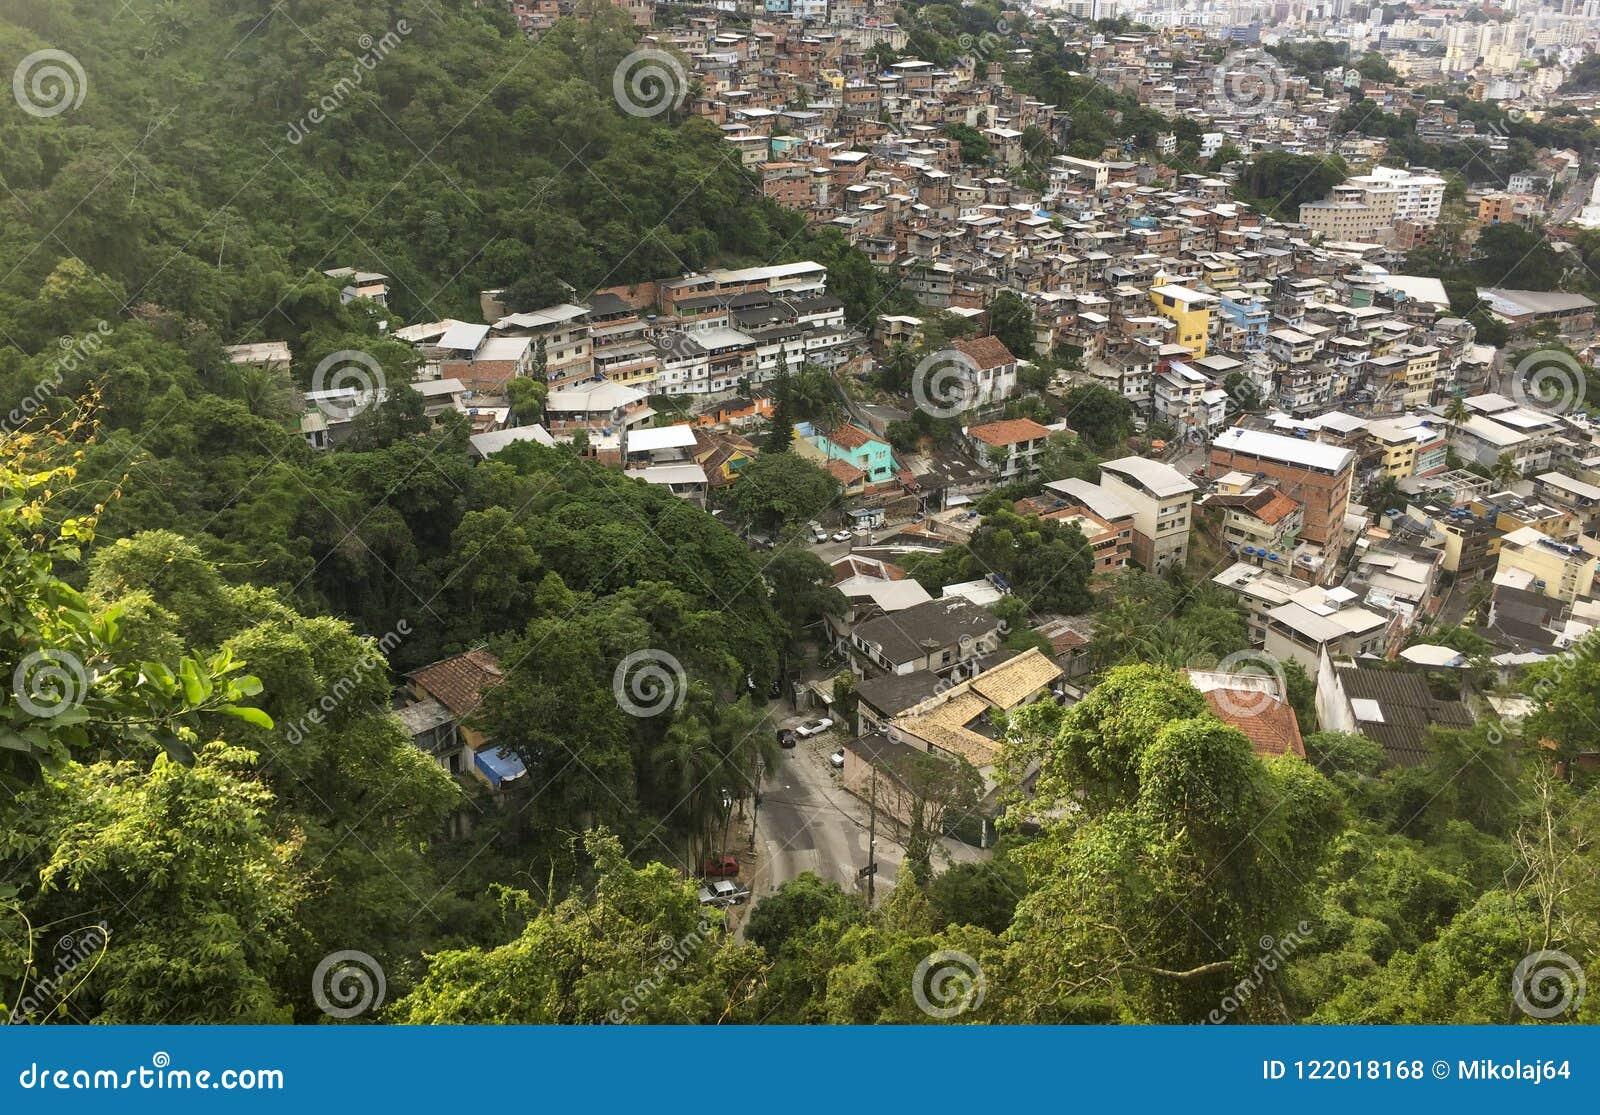 Favela Morro dos Prazeres在里约热内卢